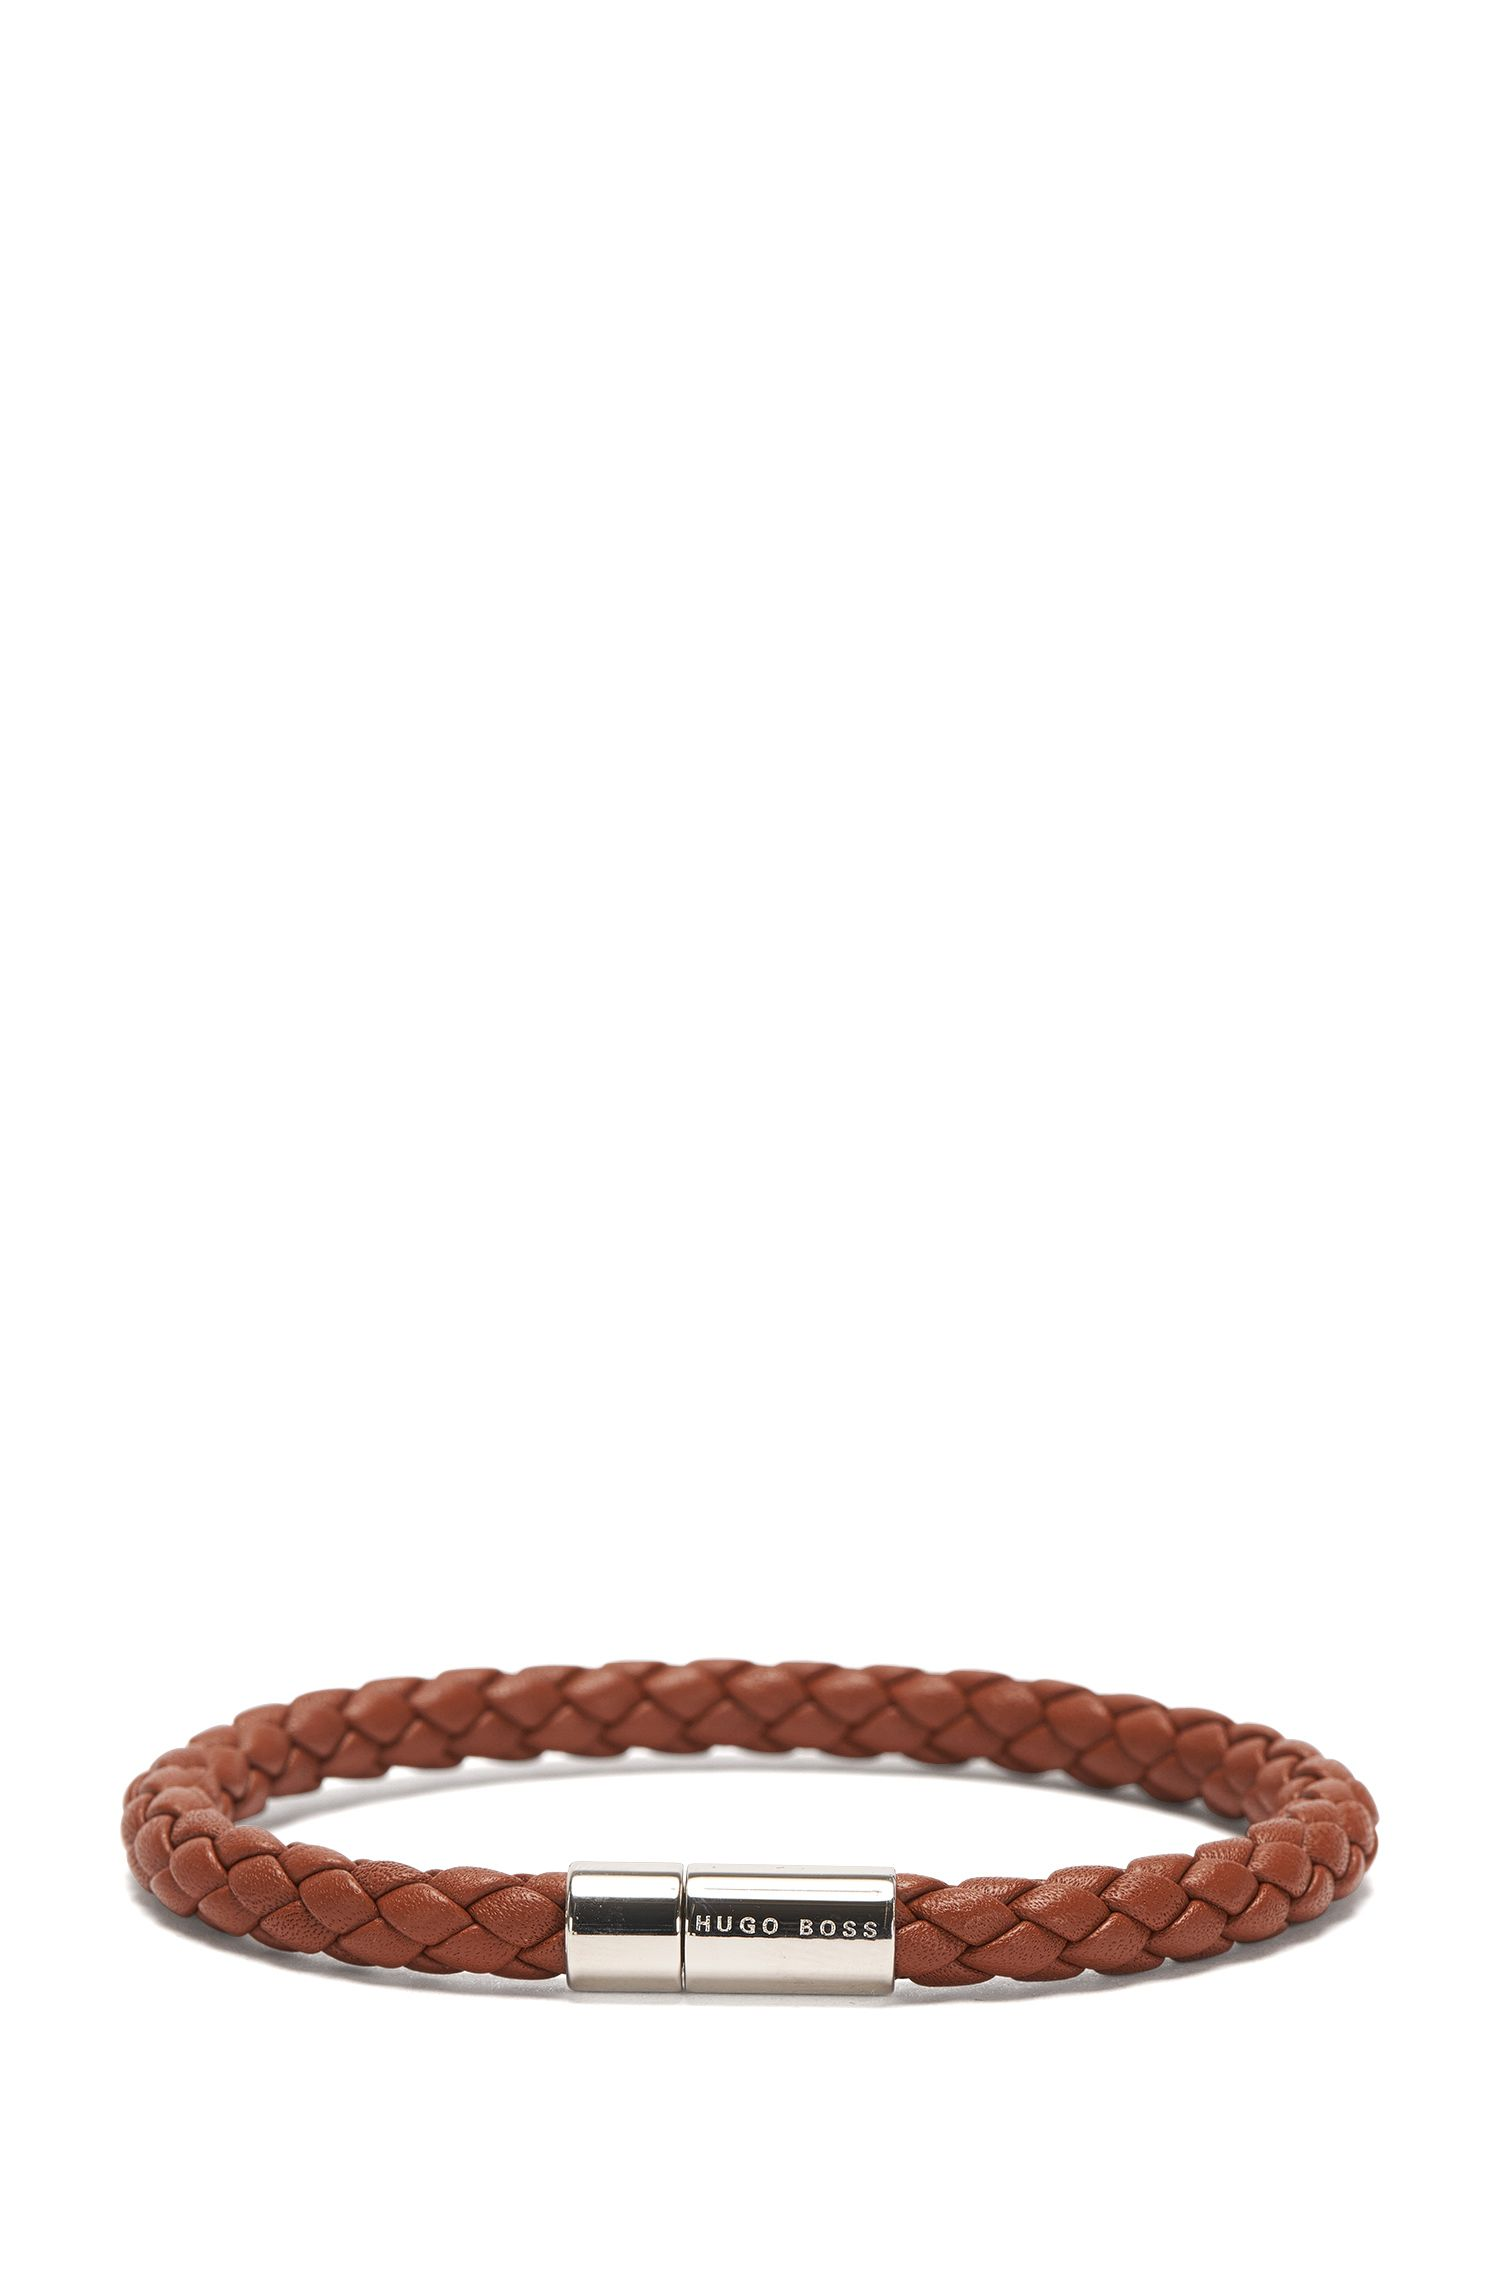 Armband aus Leder in Flecht-Optik: 'Balthazar'